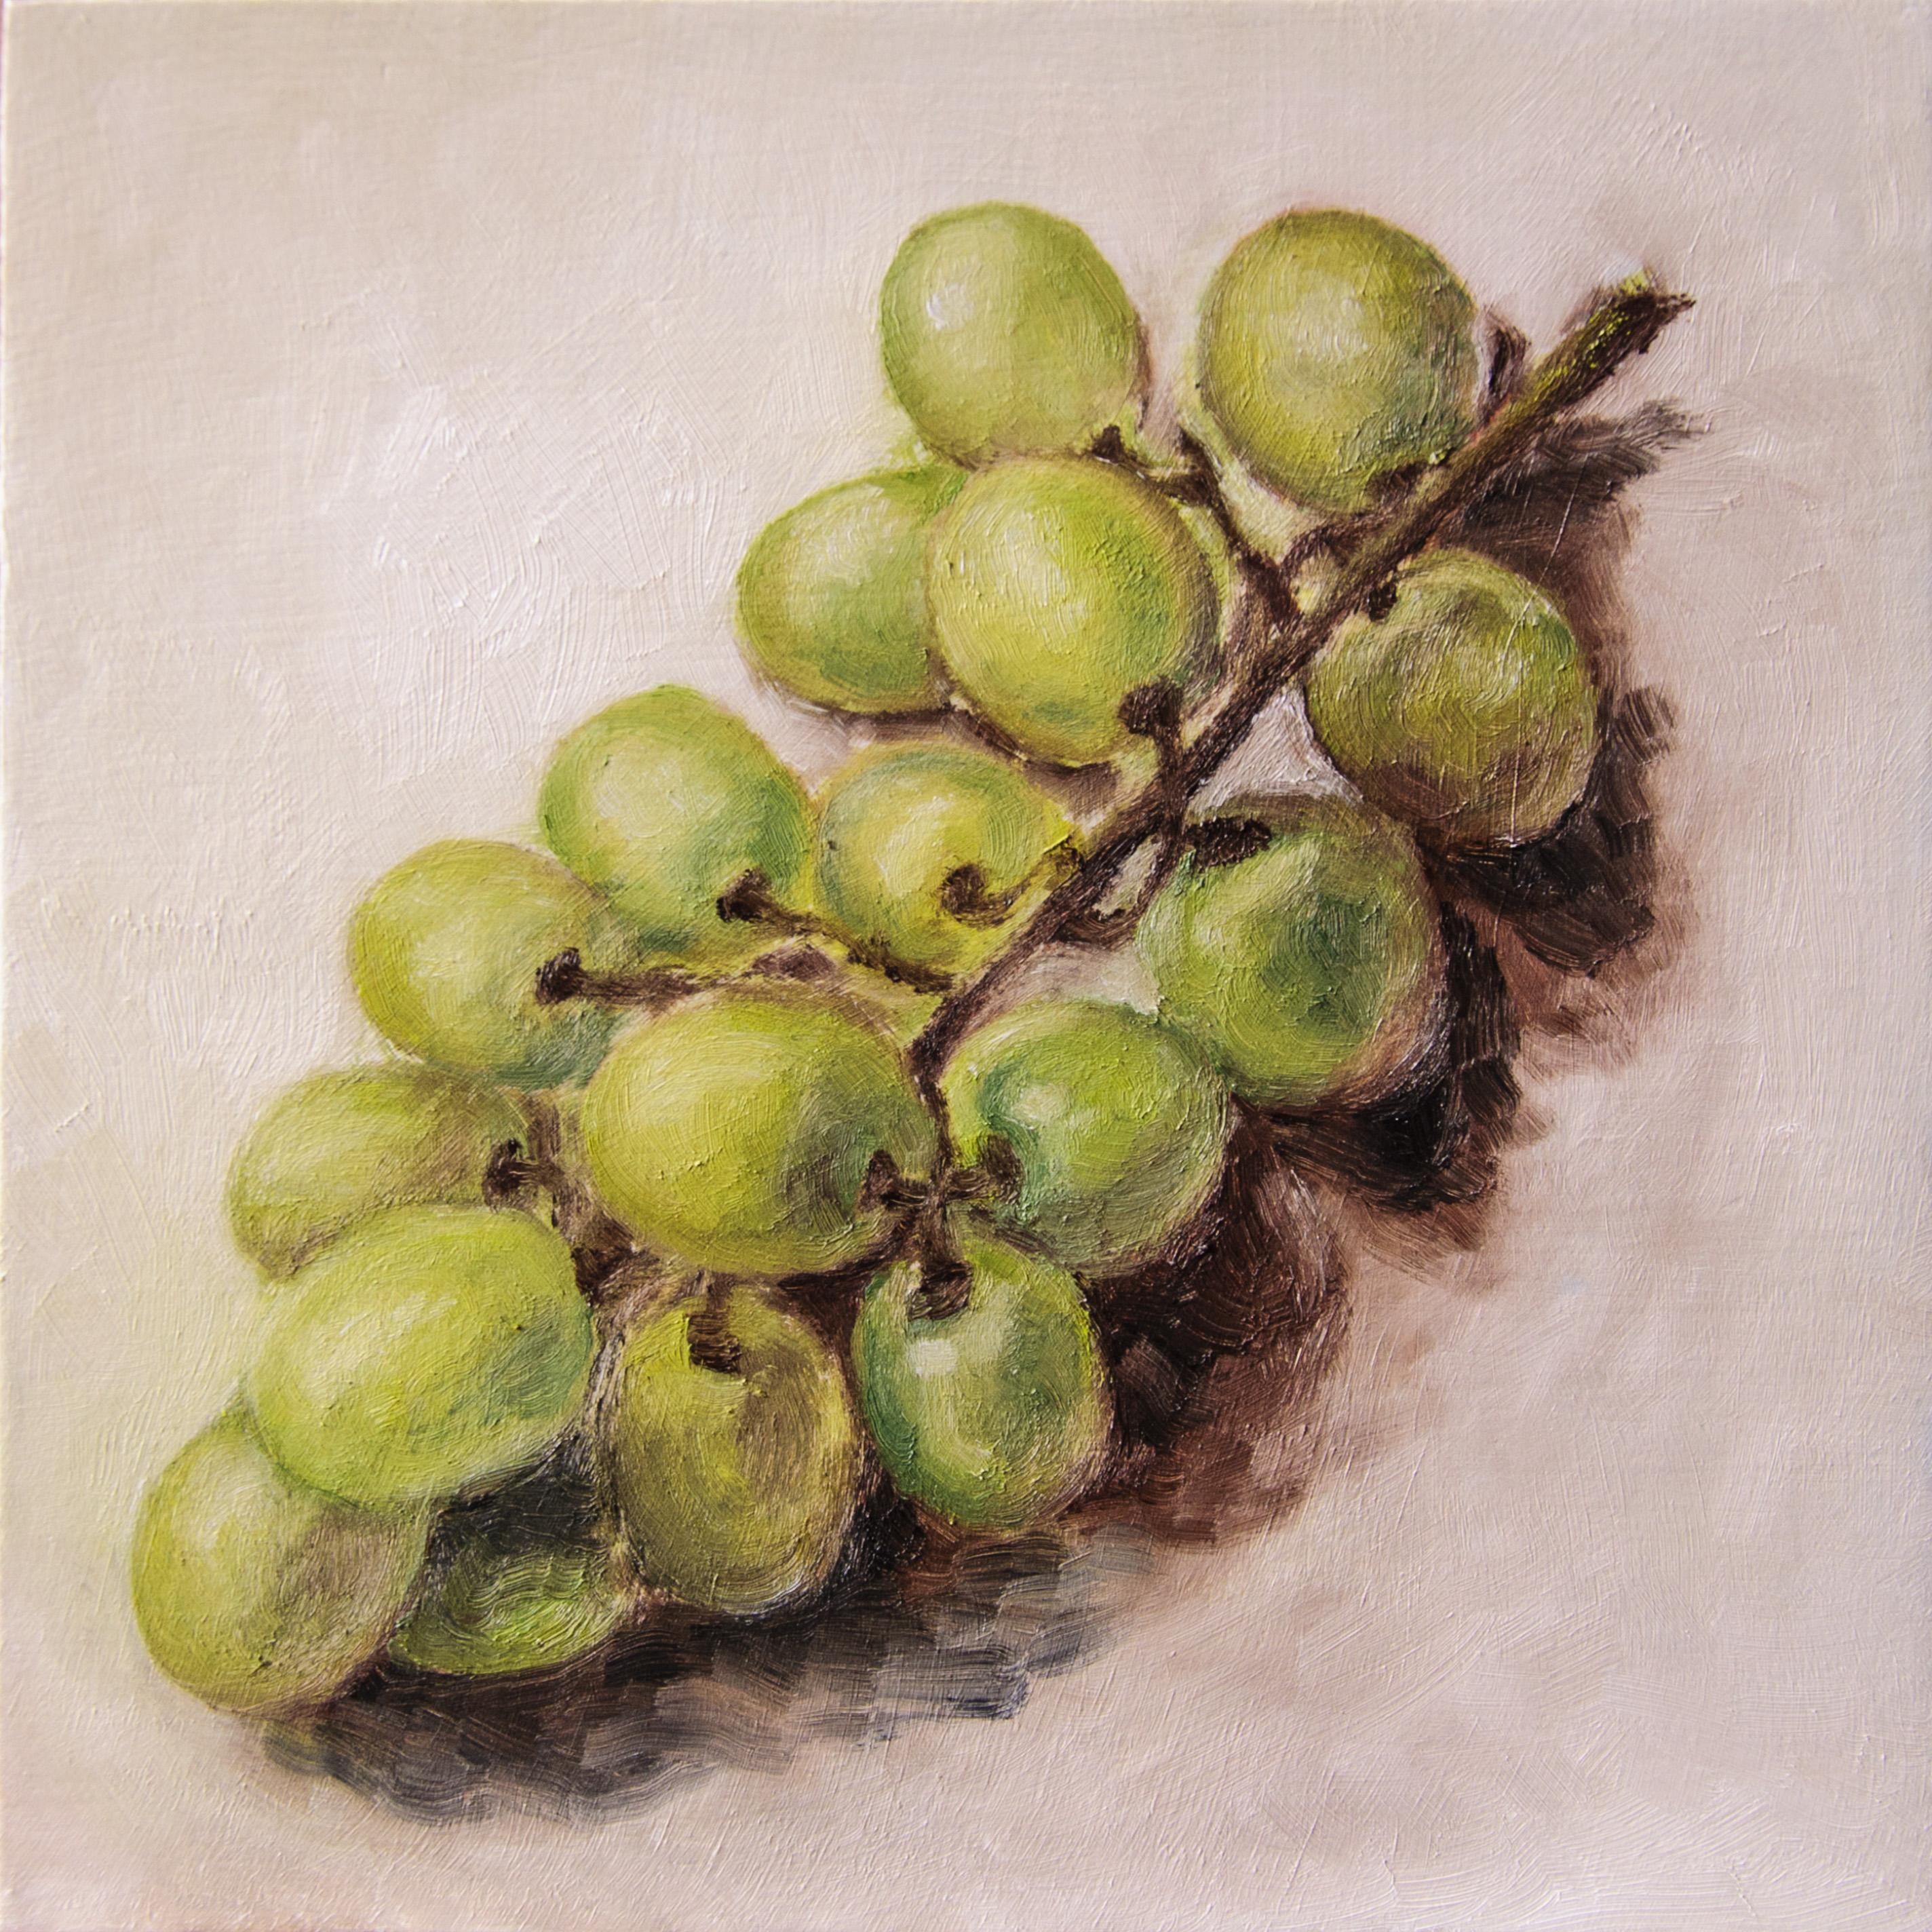 131030 Grapes